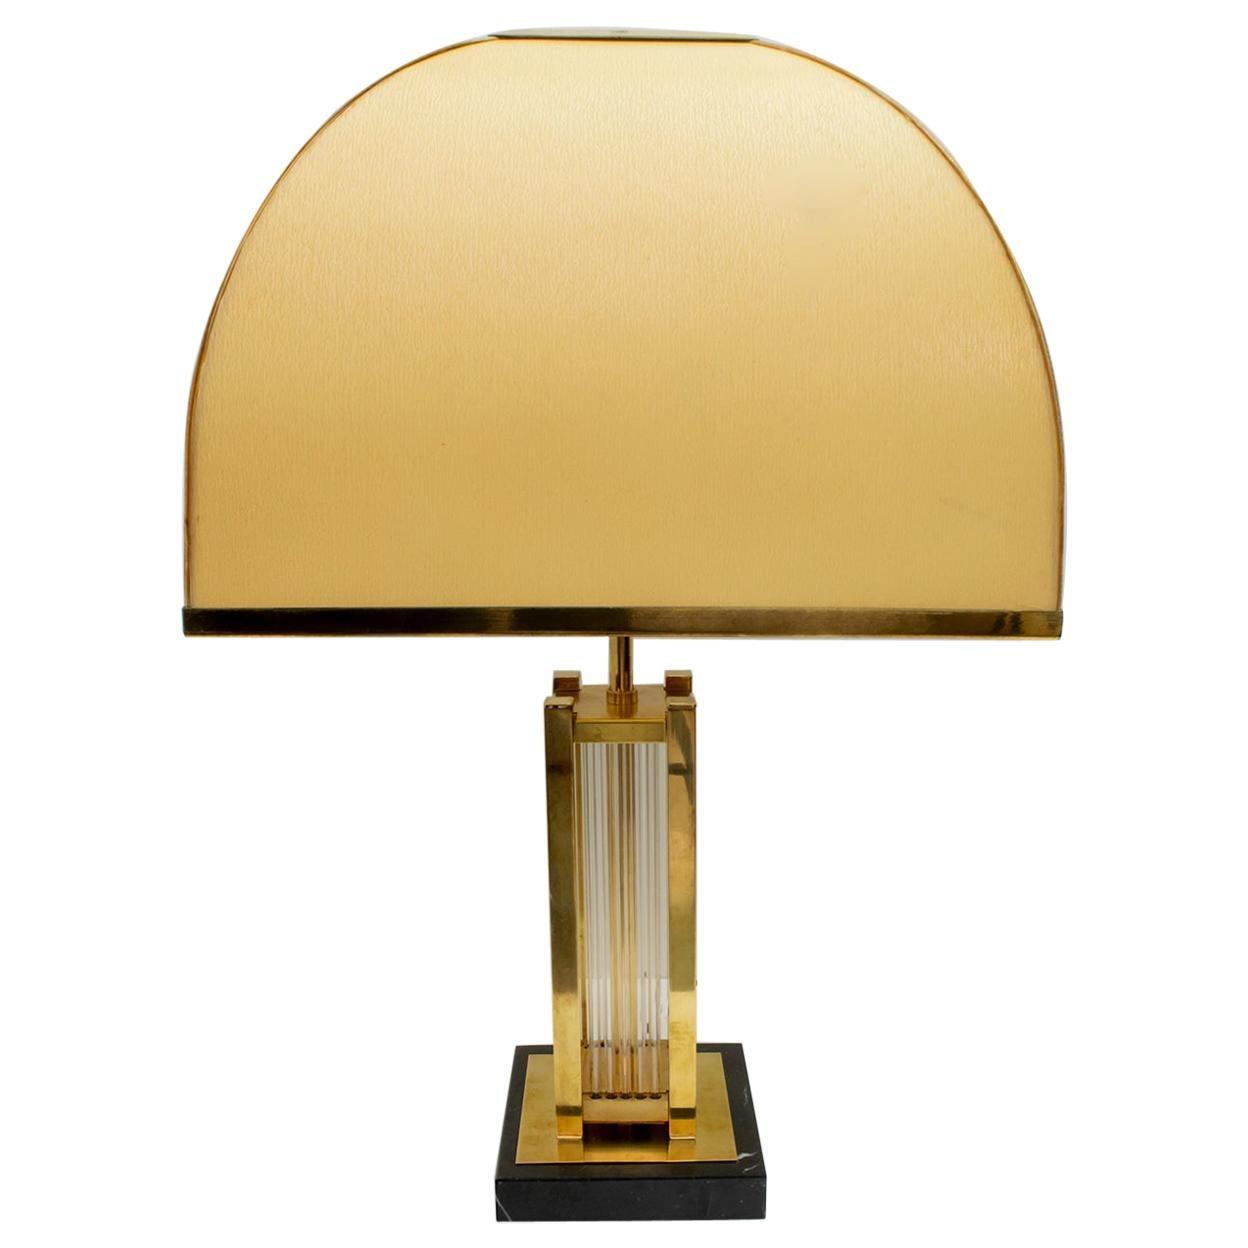 Romeo Rega Mid-Century Modern Italian Brass and Glass Table Lamp, 1970s